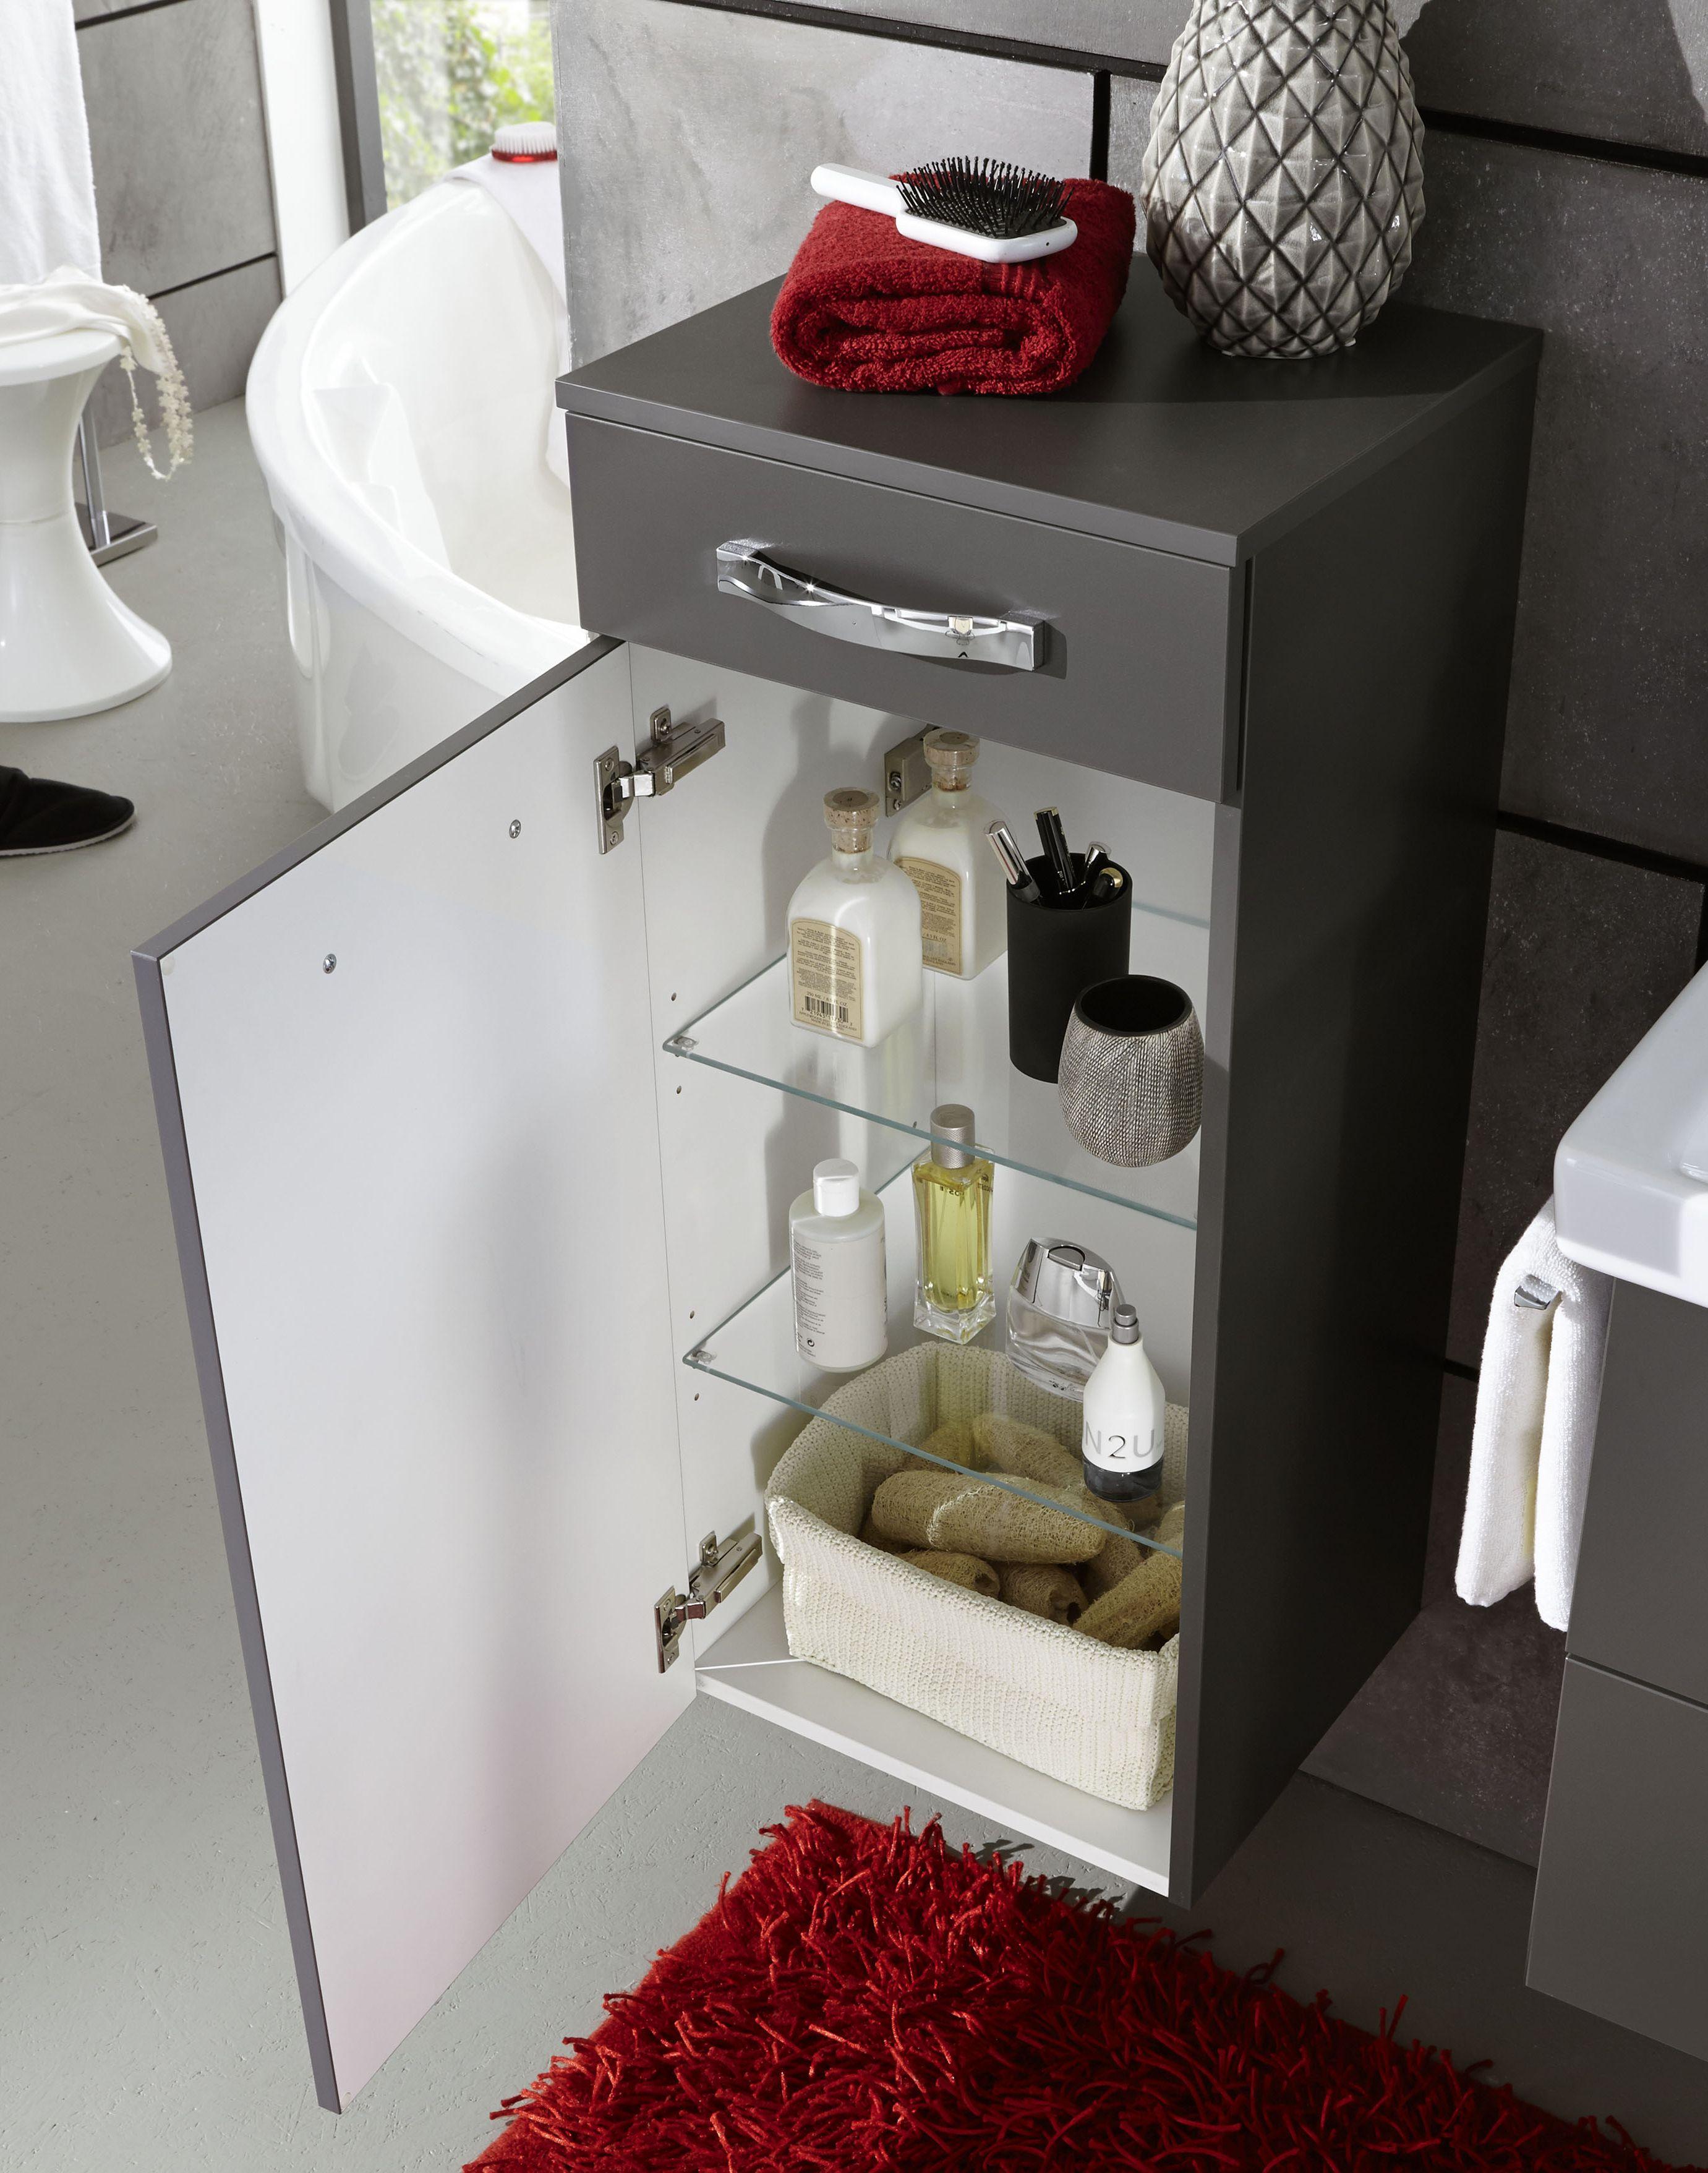 marlin programme marlin bad 3060 schr nke zubeh r g nstig kaufen m bel universum. Black Bedroom Furniture Sets. Home Design Ideas